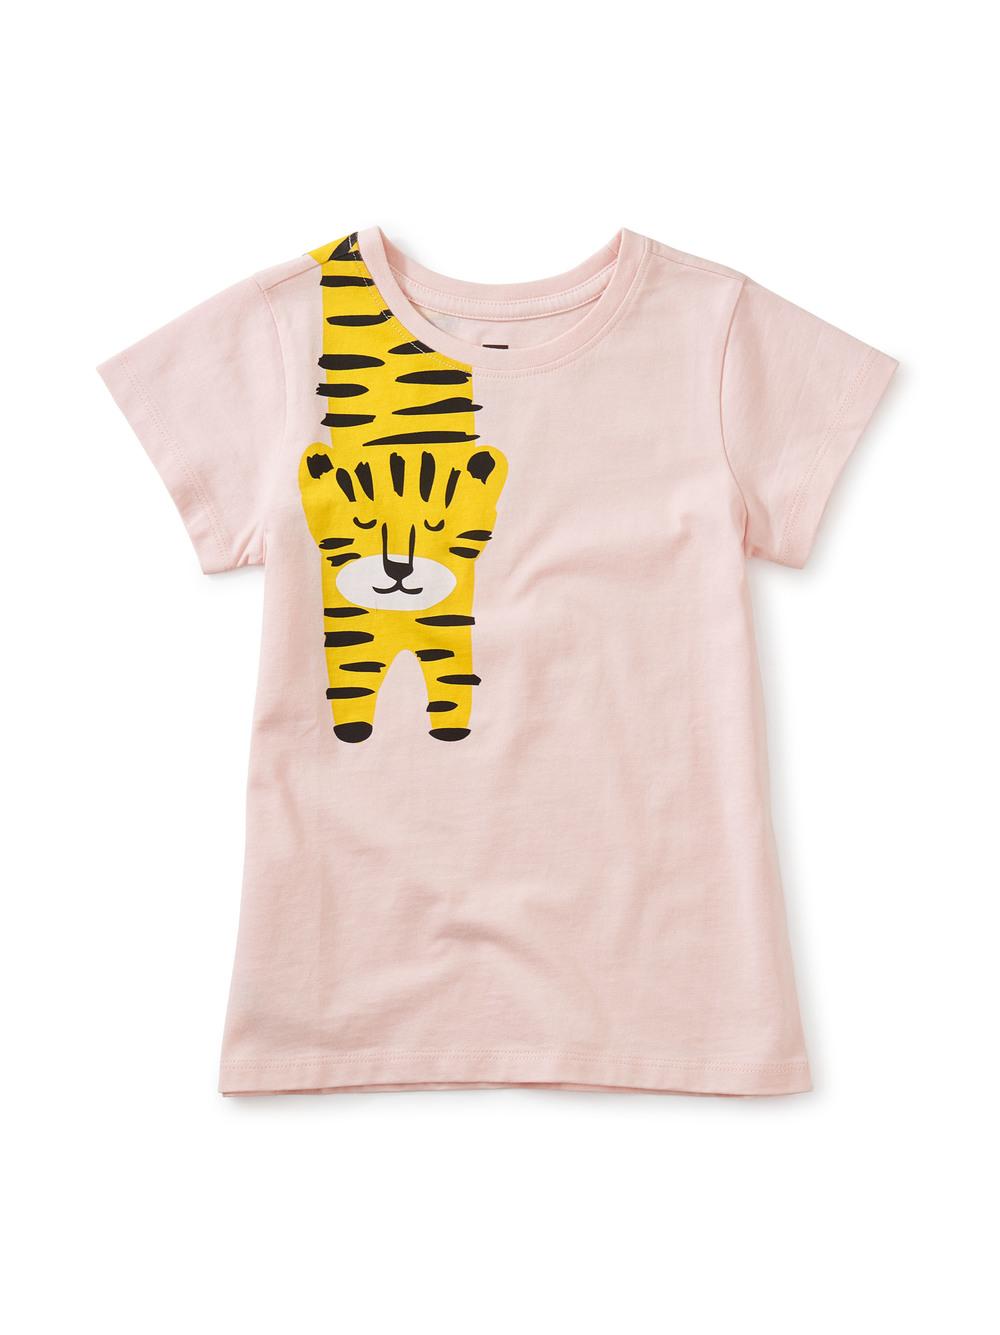 Tiger Turn Graphic Tee